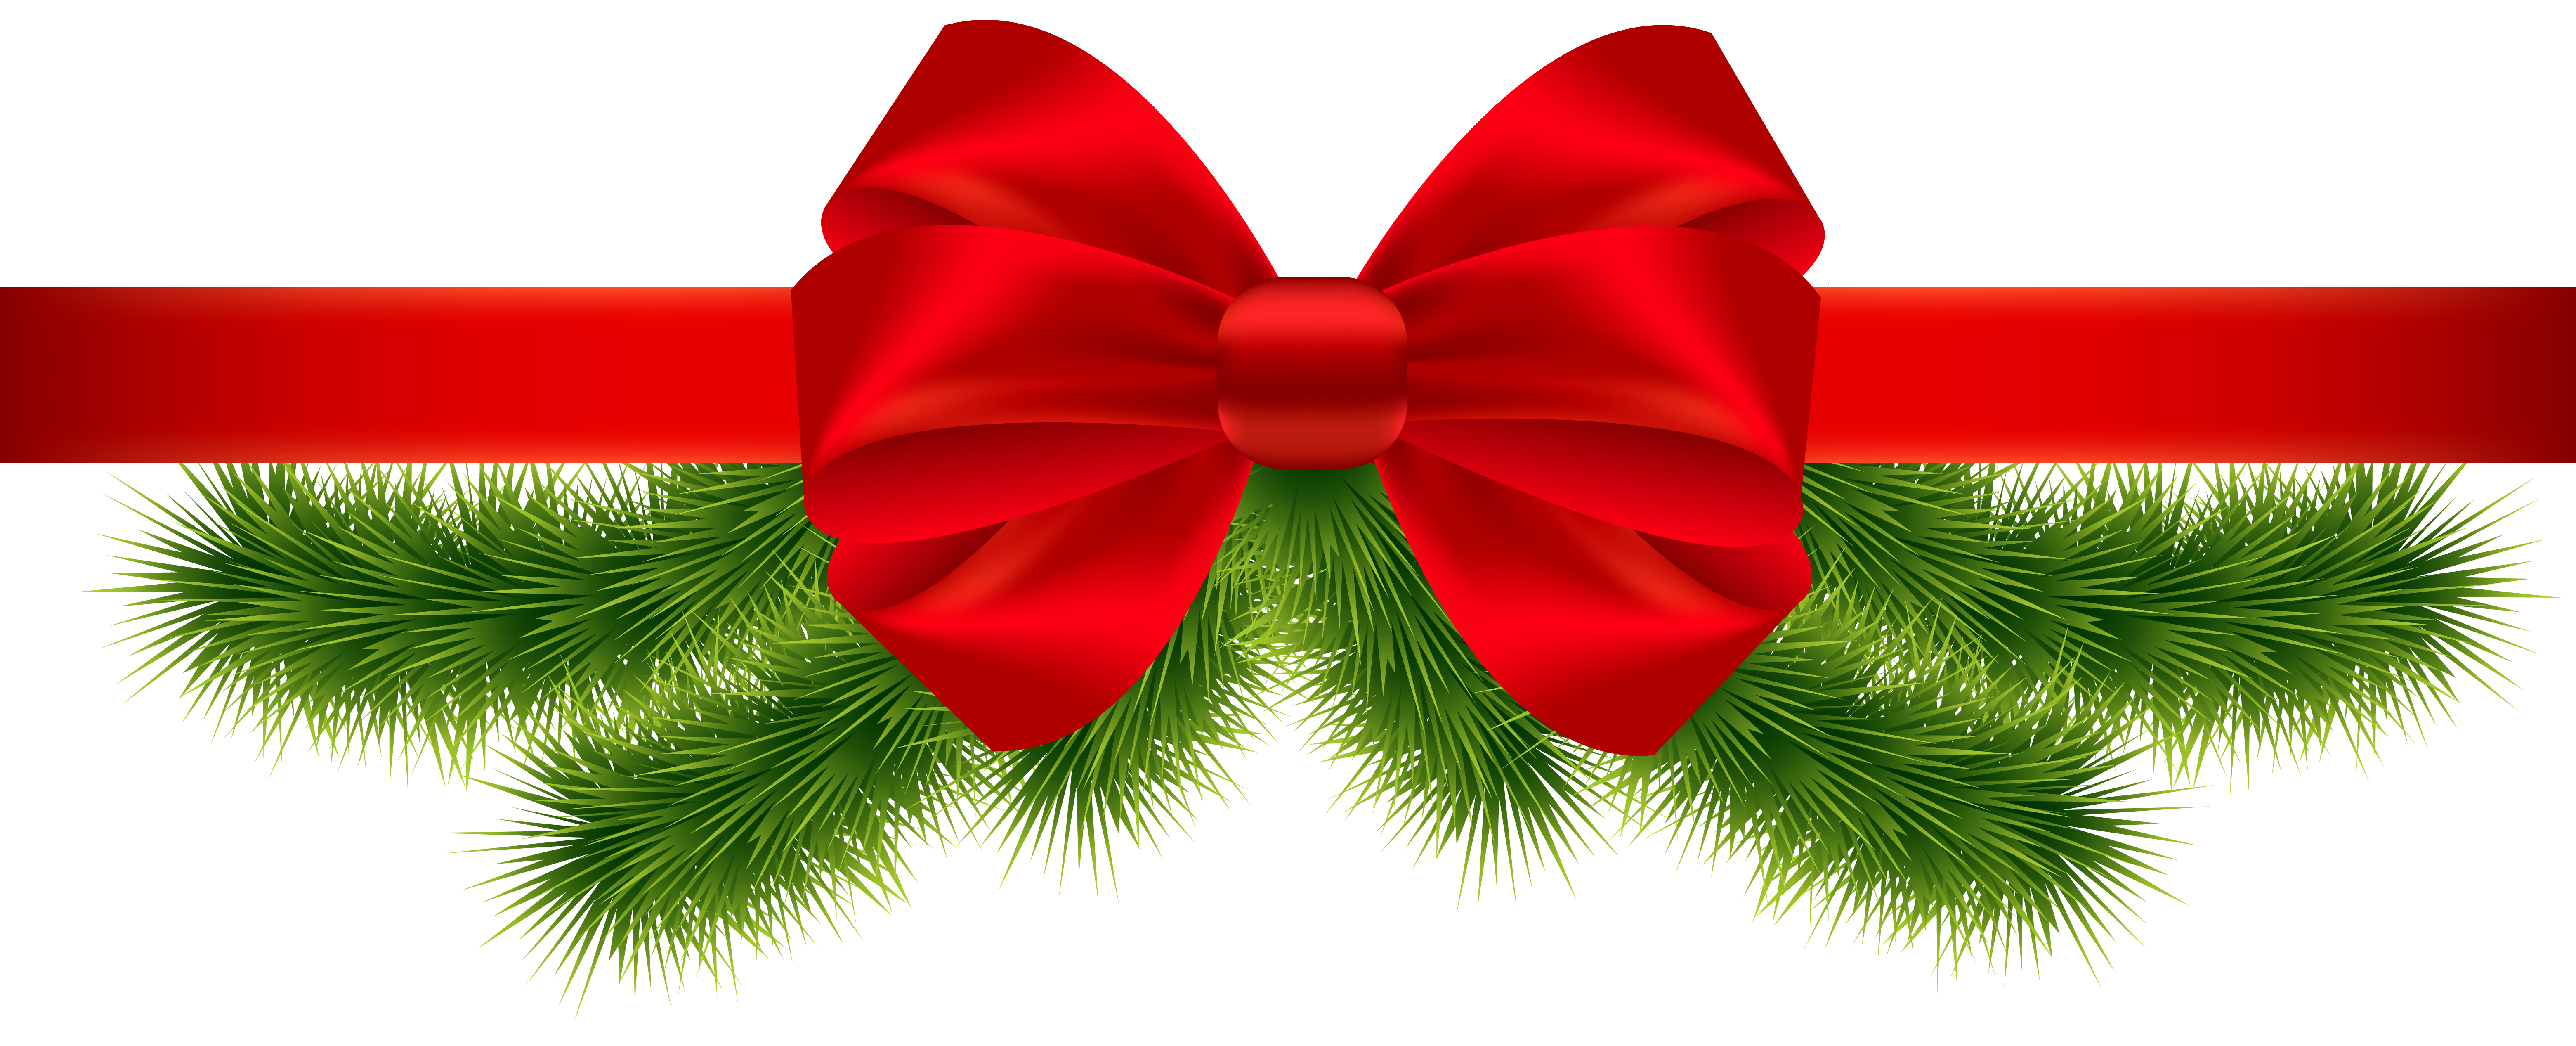 Christmas transparent png desenler. Holly clipart ribbon